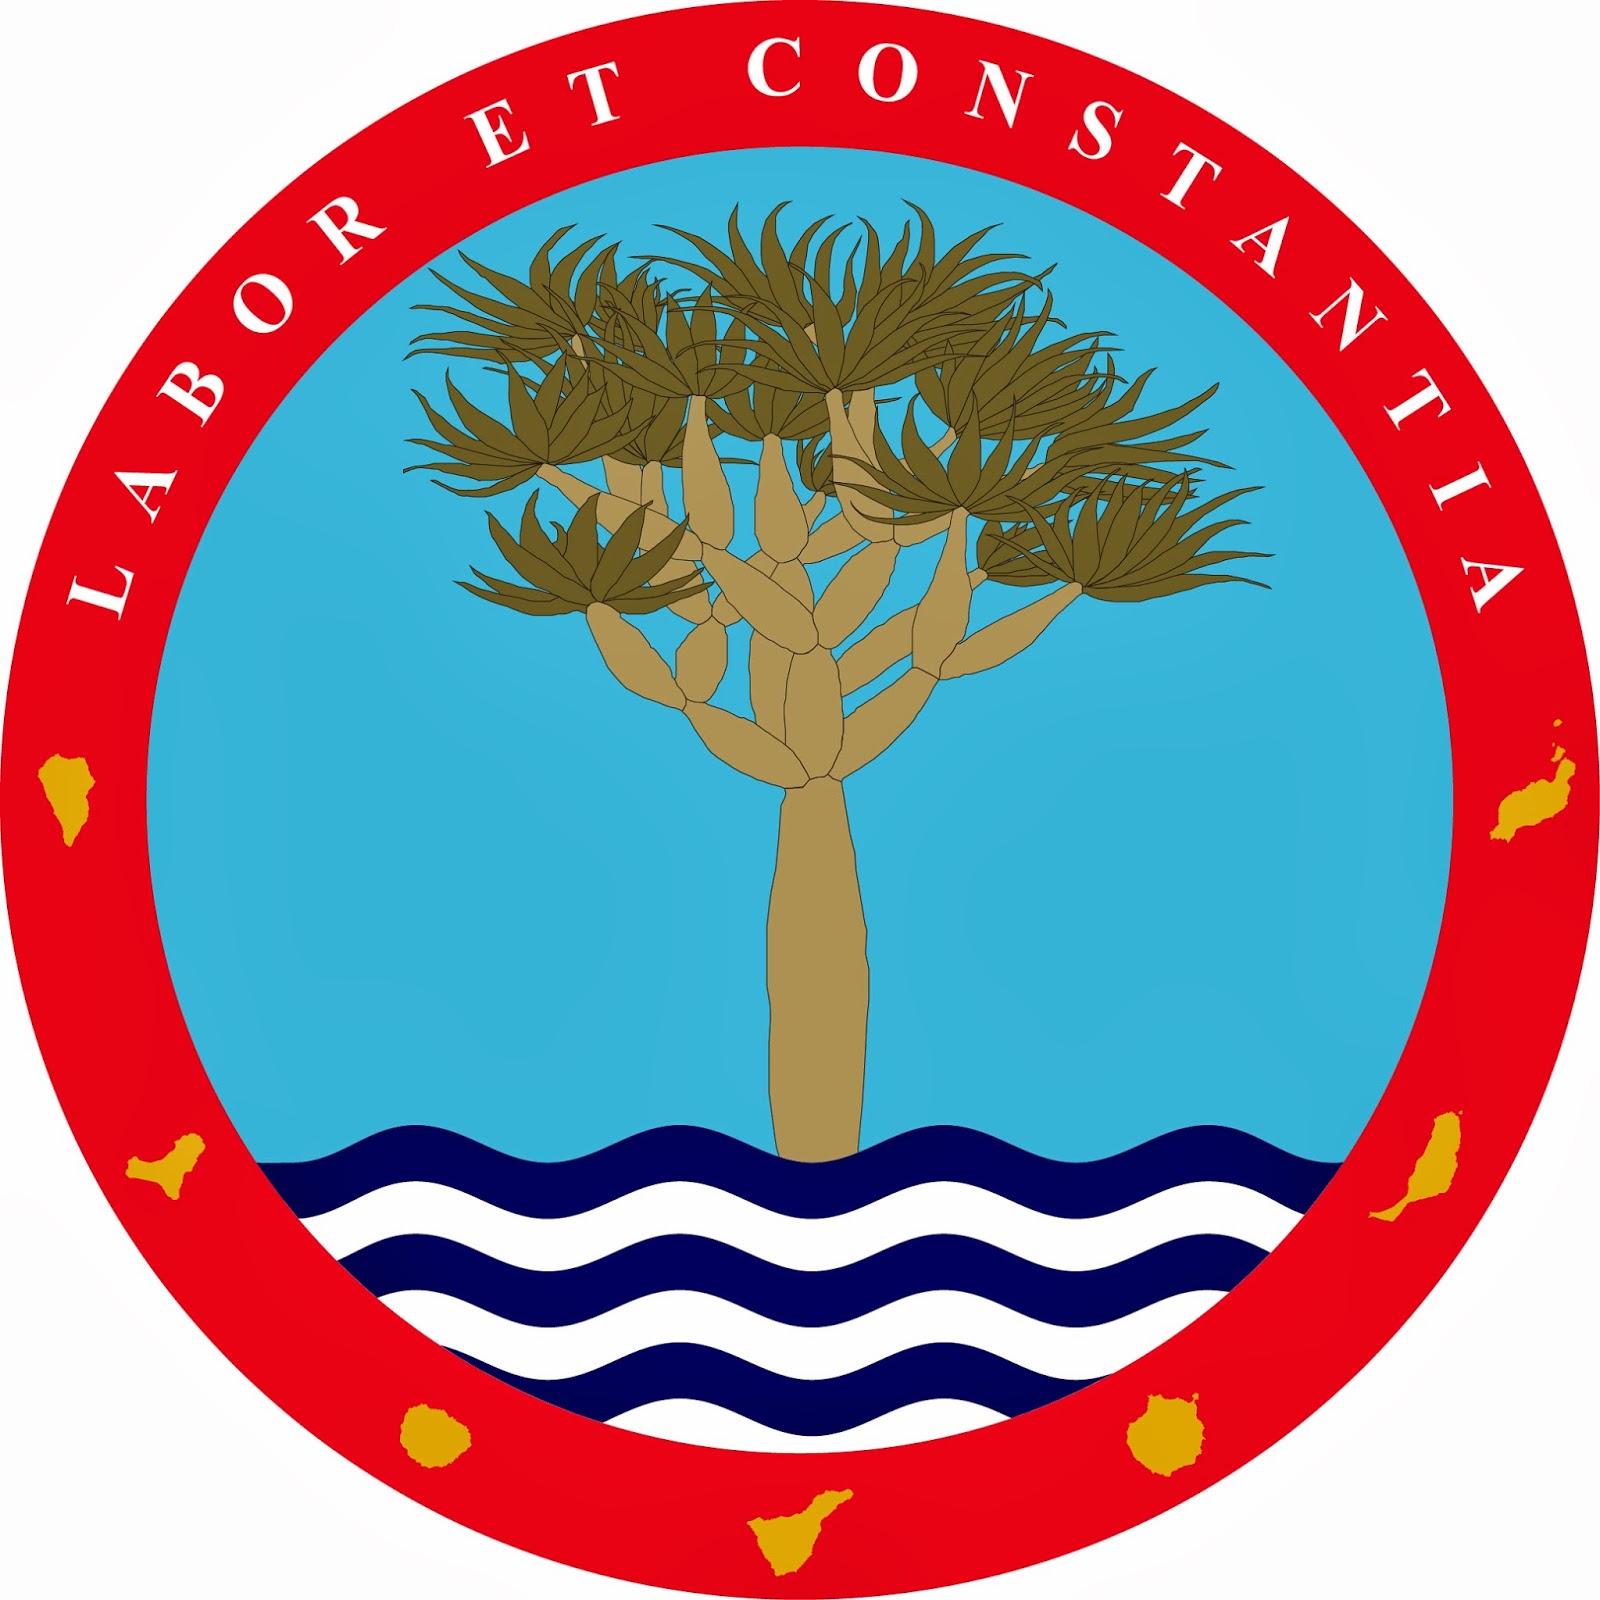 I Congreso Internacional de Genealogía e Historia Familiar de Canarias